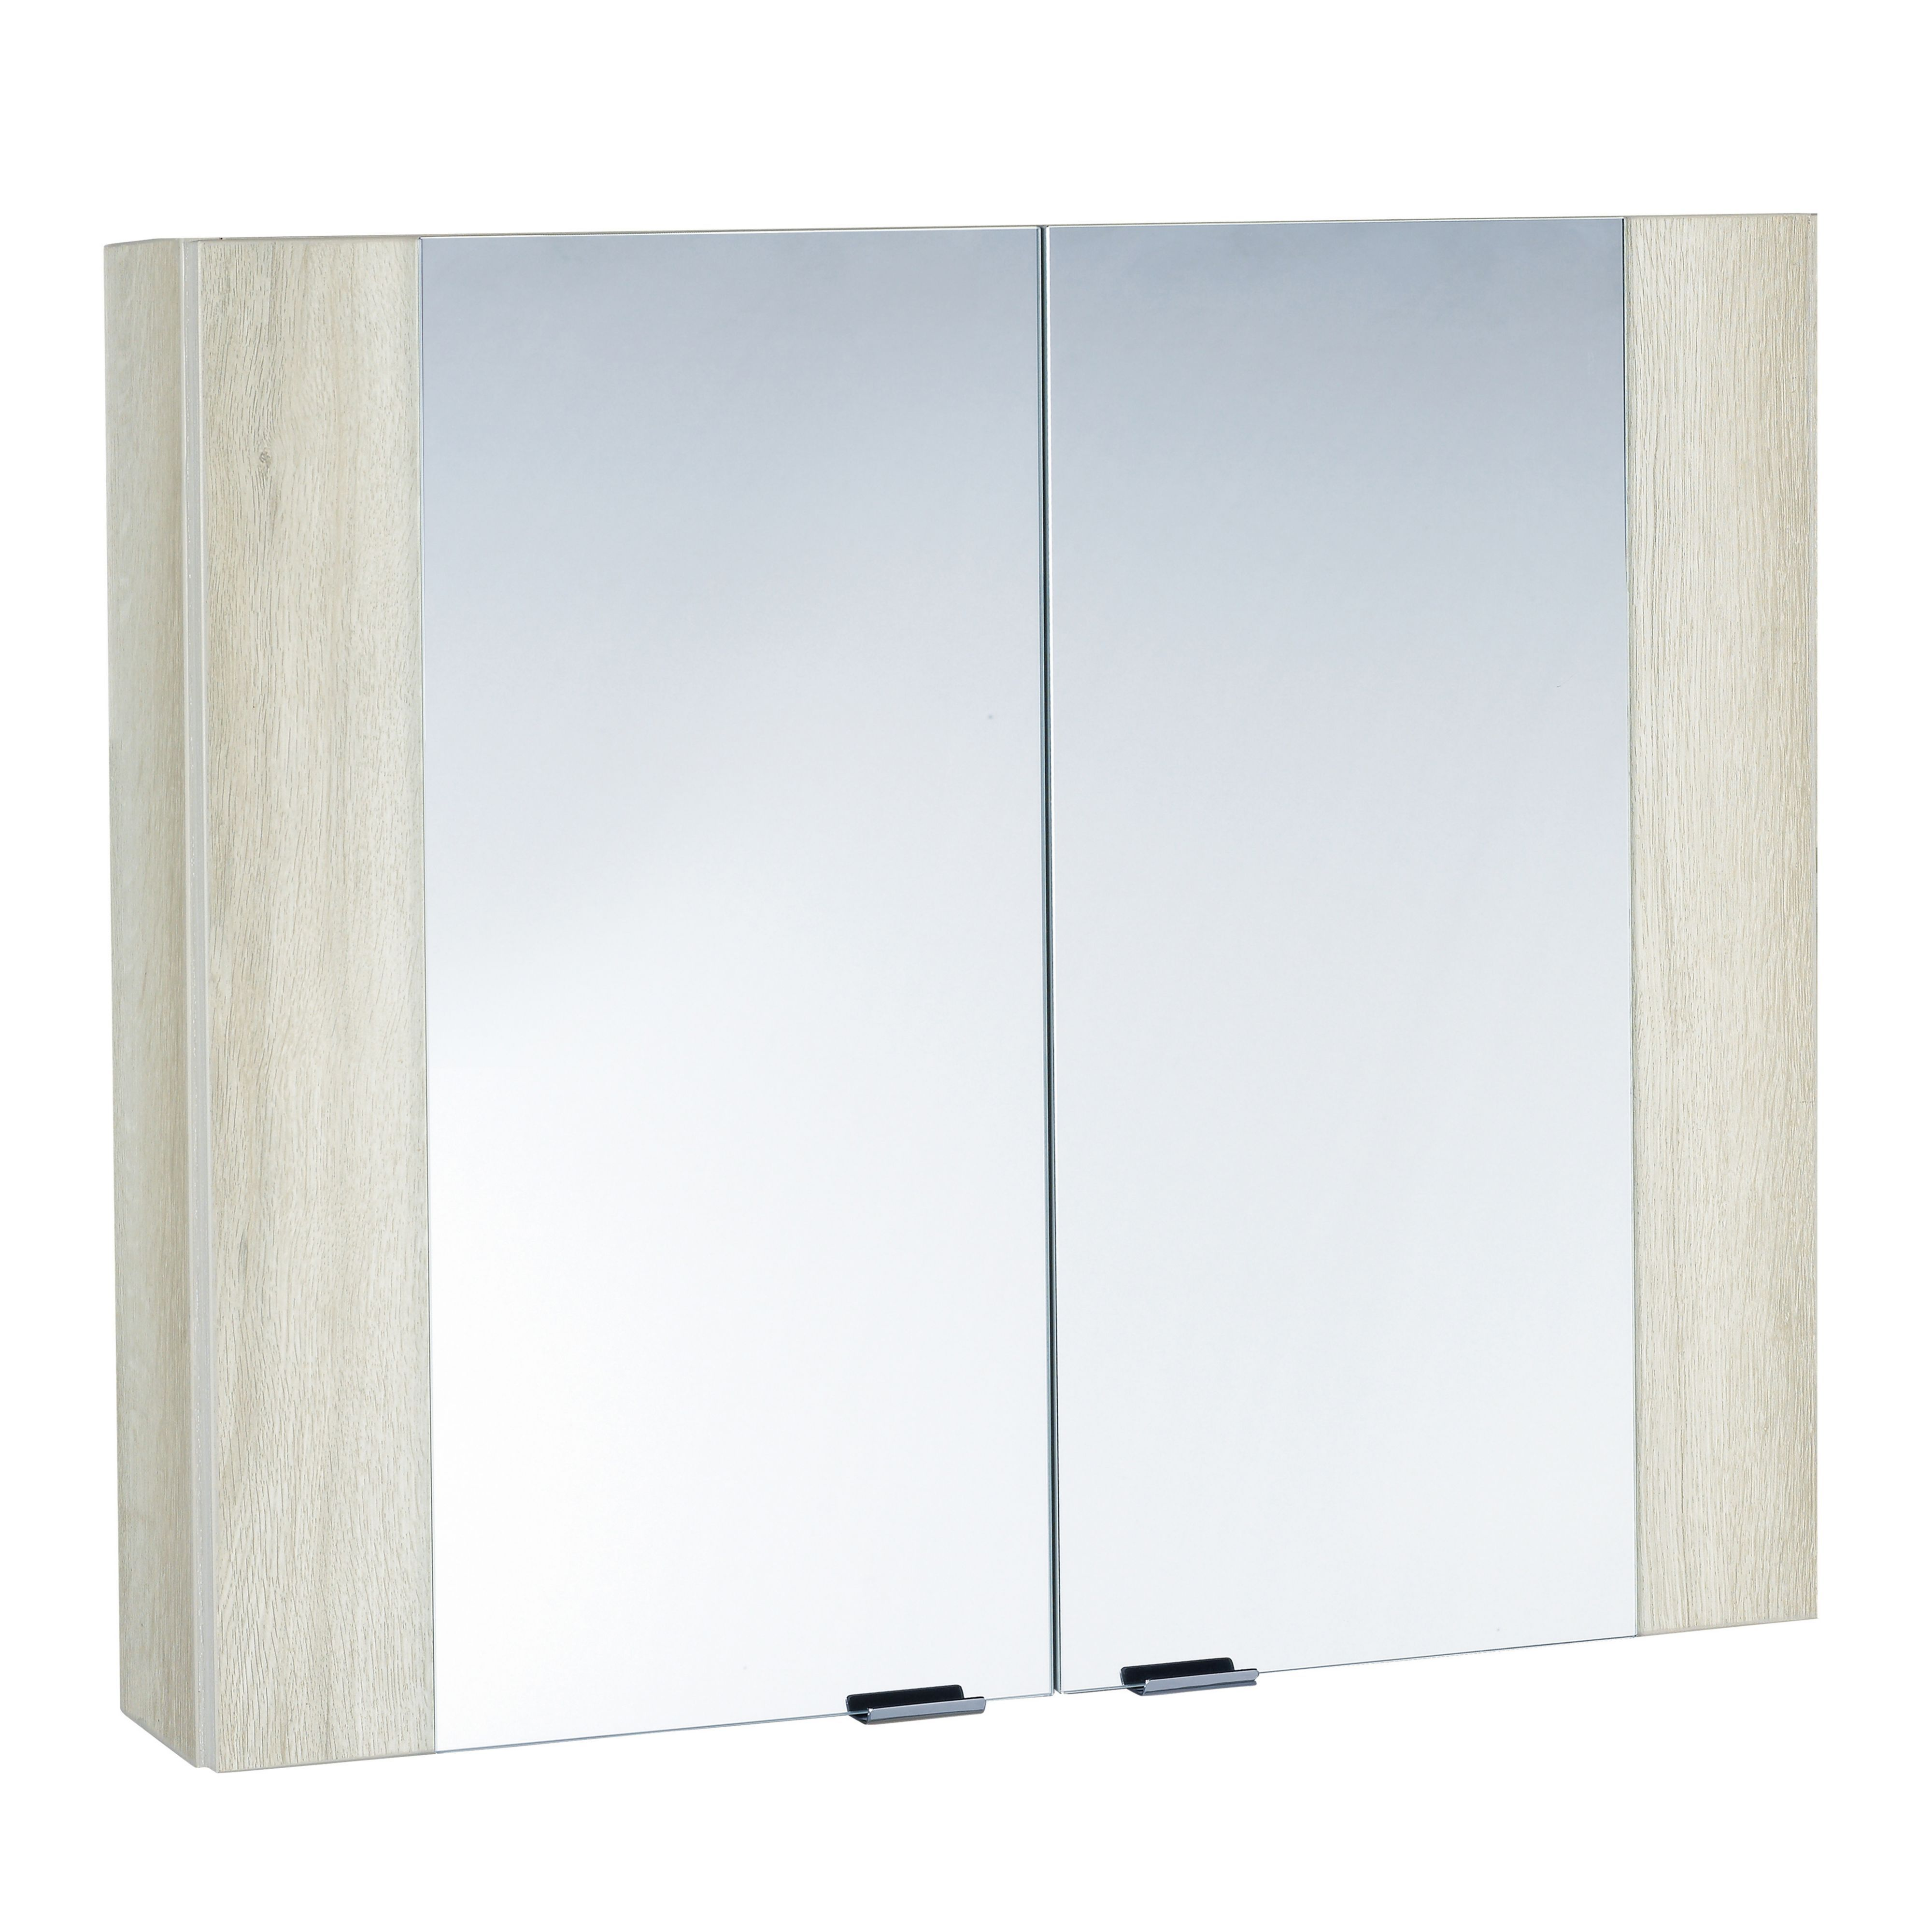 Cooke lewis amazon double door white light oak effect for Double mirror effect